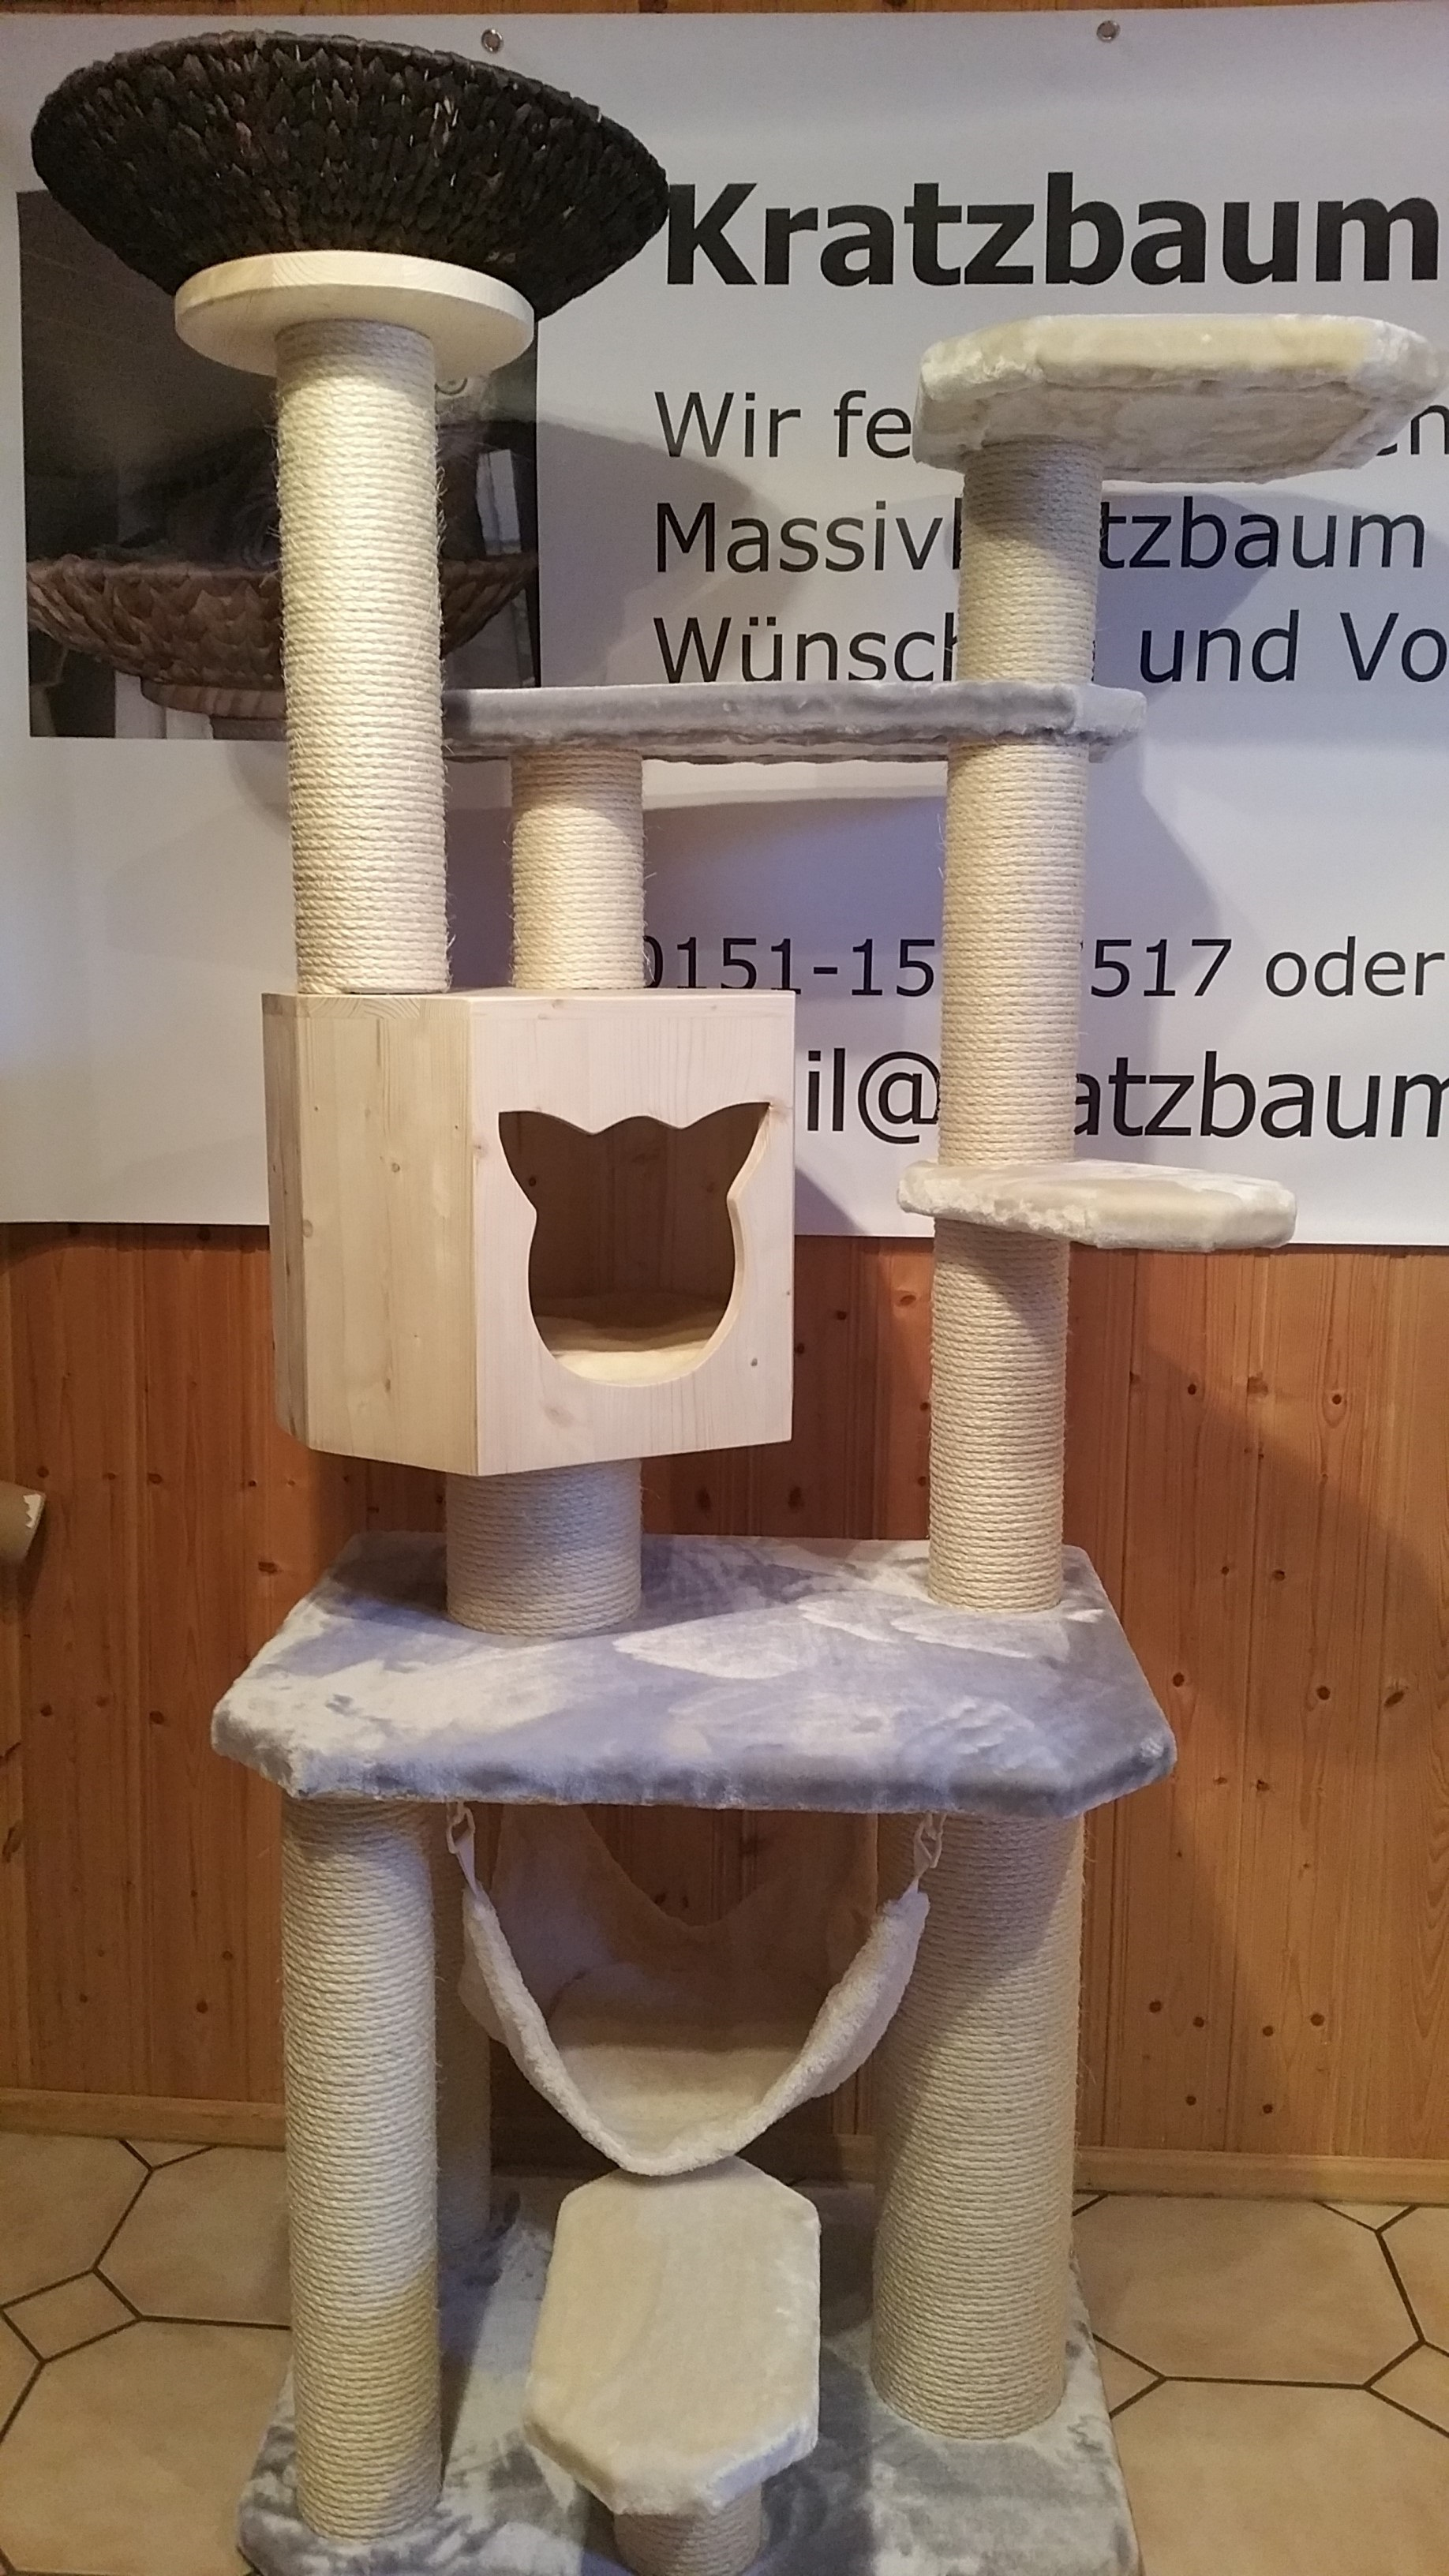 kratzbaum massiv f r gro e katzen xxl st mme liegekorb f r katzen stabiler kratzbaum. Black Bedroom Furniture Sets. Home Design Ideas